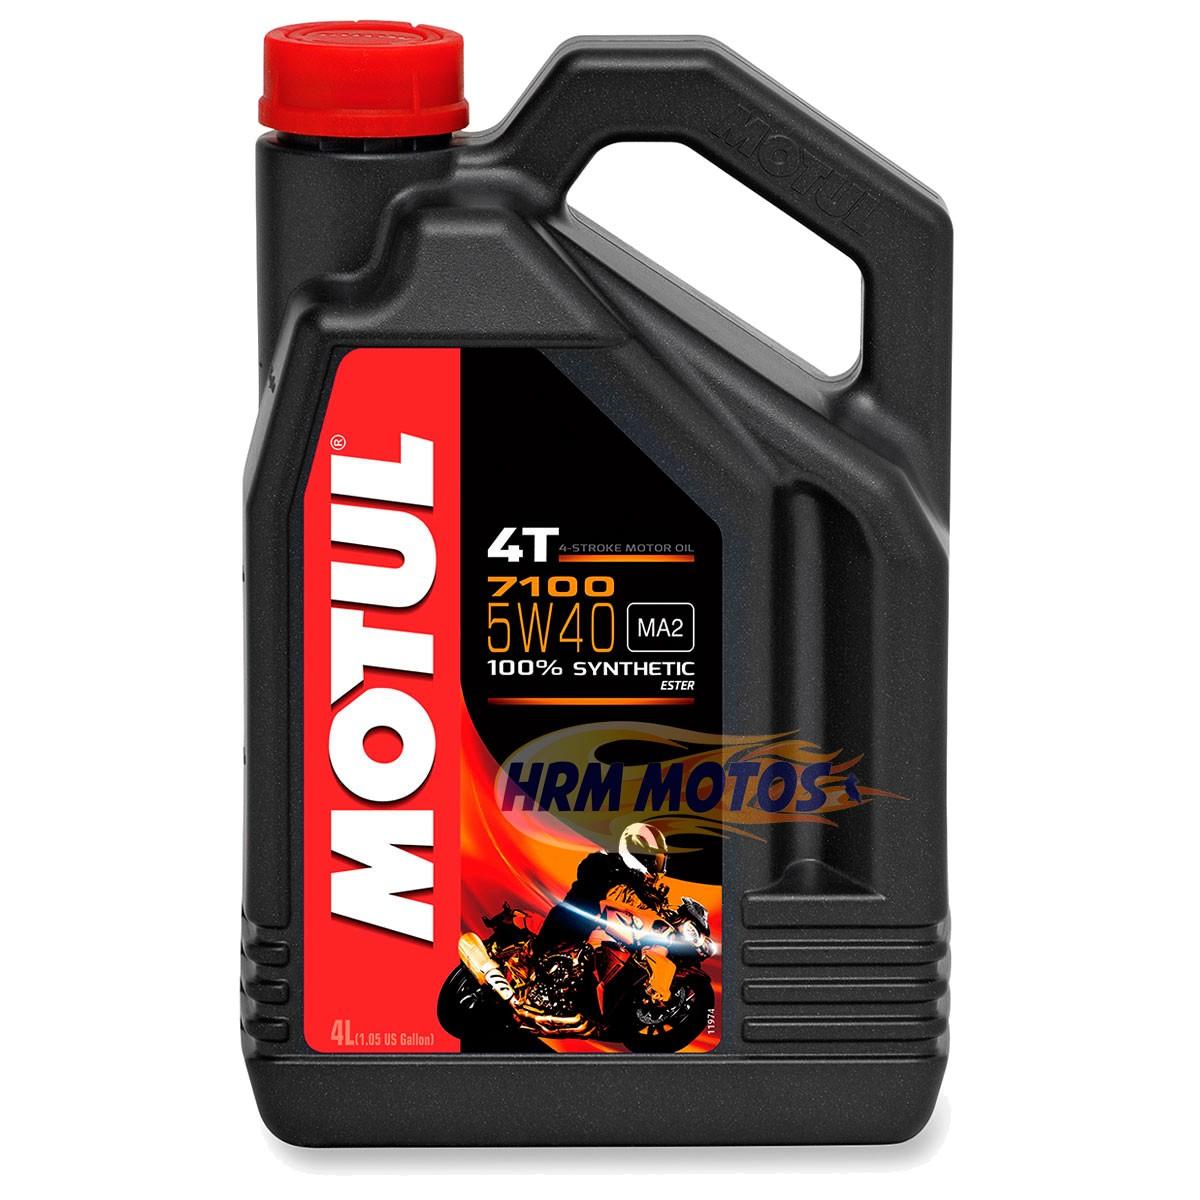 Óleo Motor Motul 4t 7100 5w40 100% Sintético (4 litros) S1000RR R1200 GS F800R GALÃO